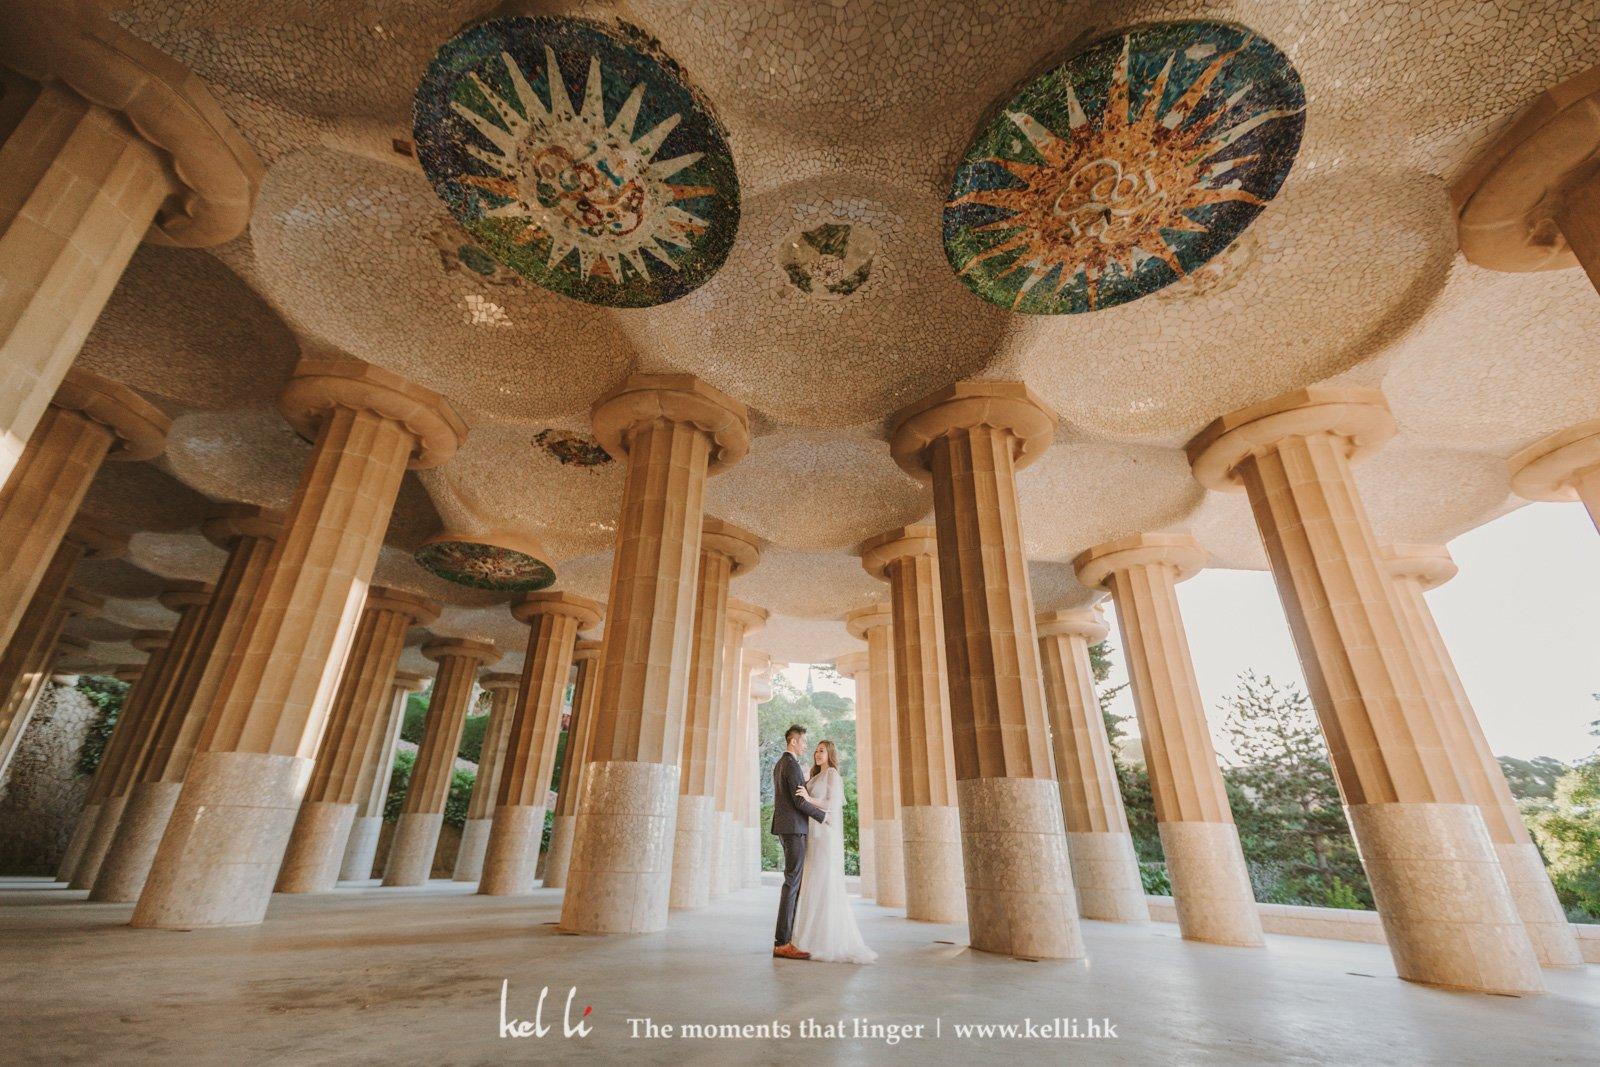 Dancing in the pillar